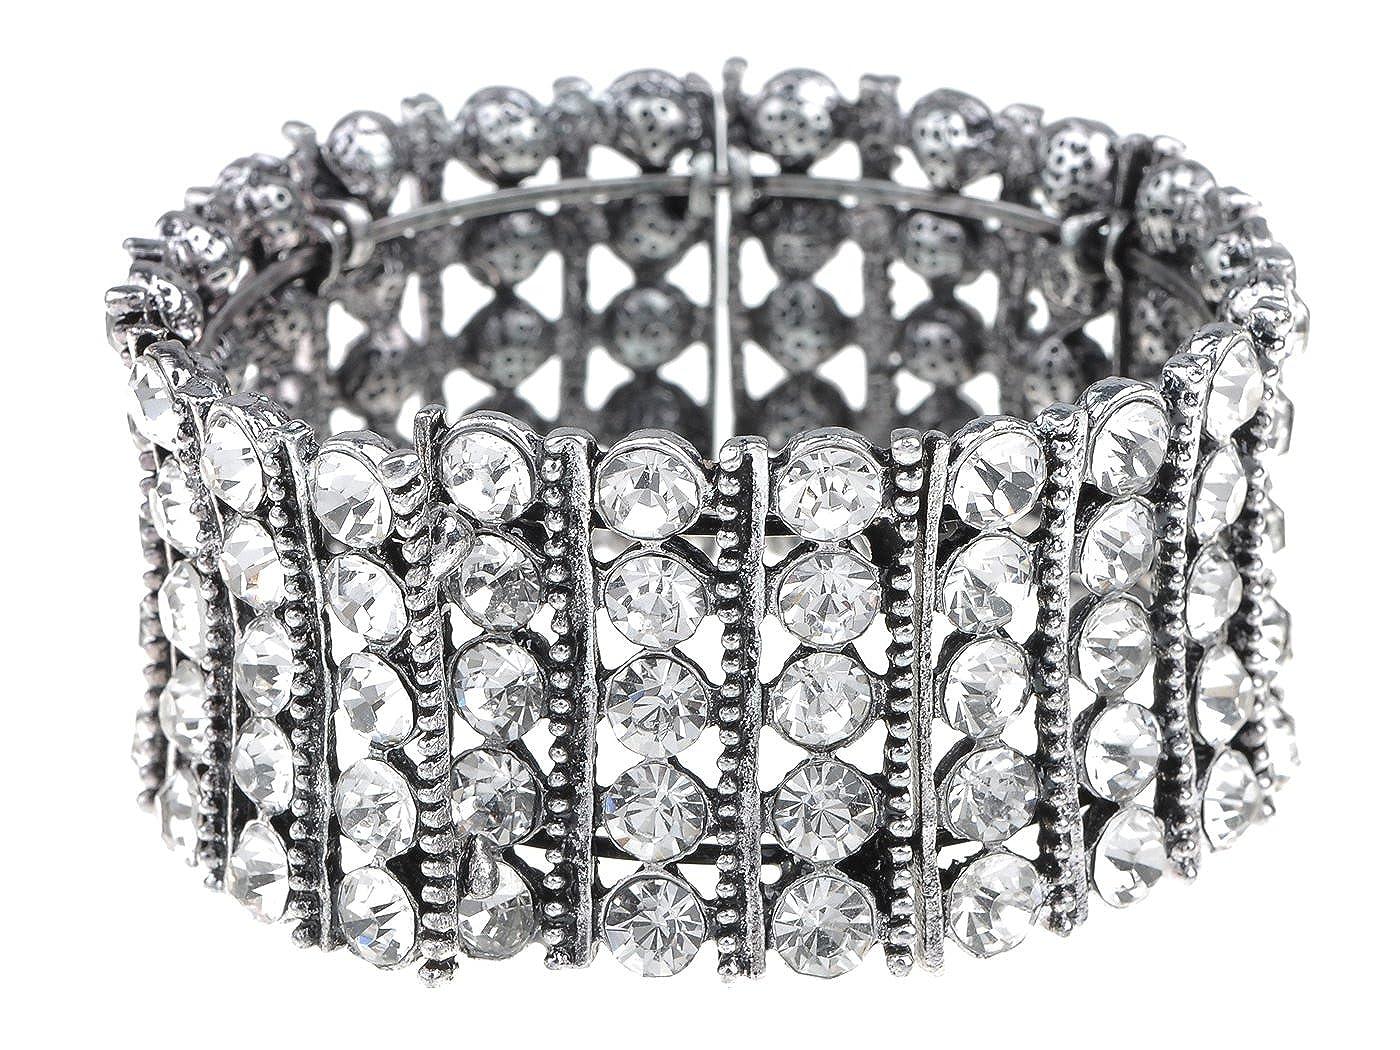 Alilang Classy Elegant Silver Tennis Rhinestone Bridal Crystal Jewelry Bangle Cuff Bracelet